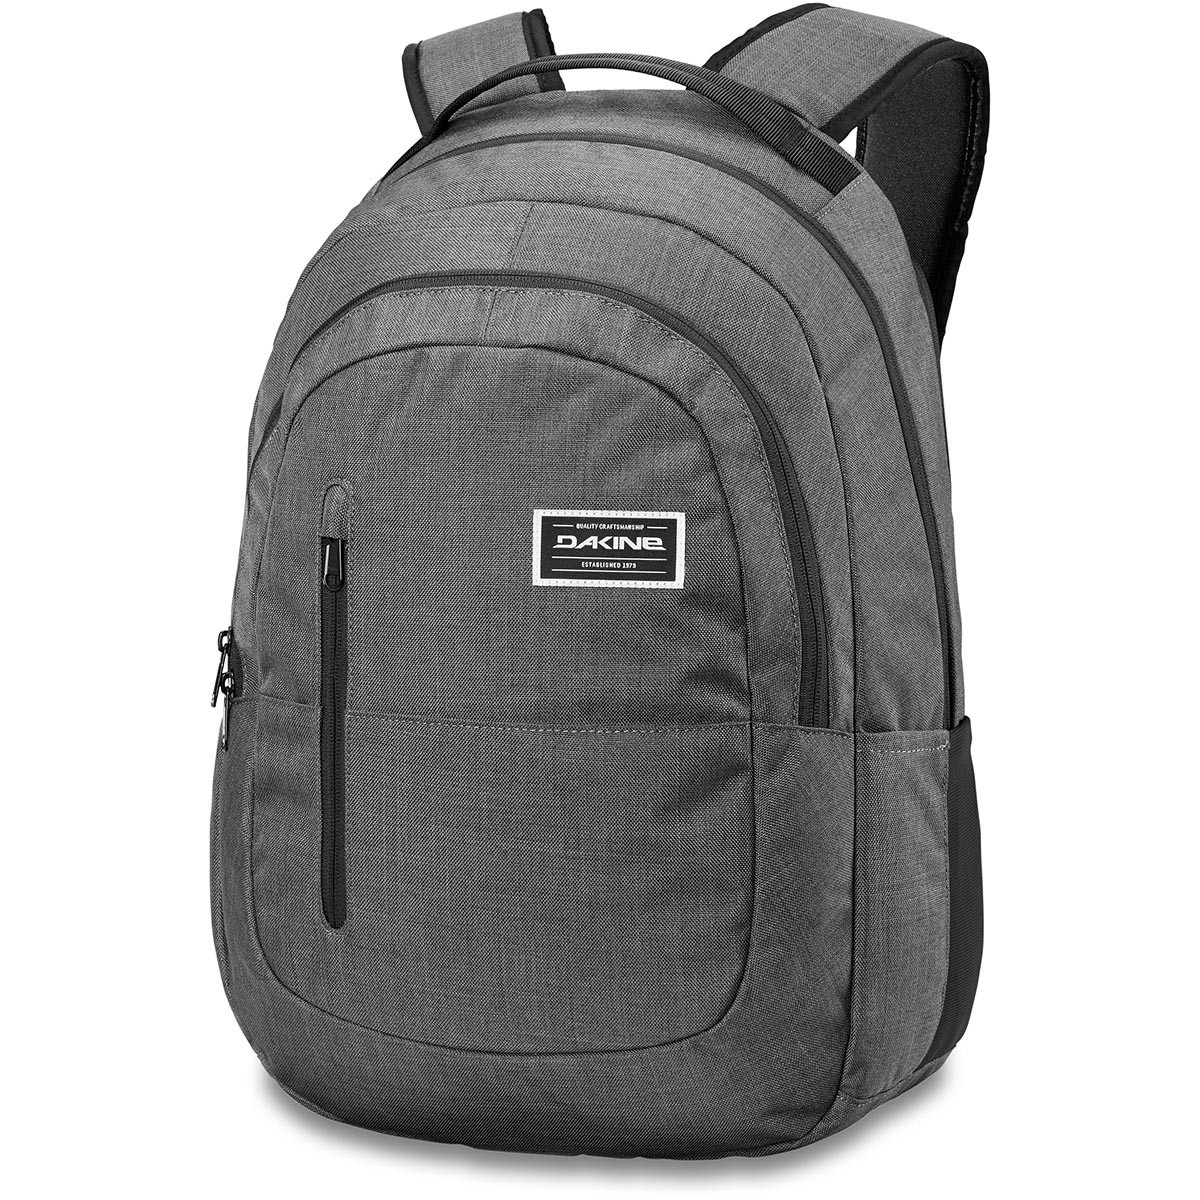 80a921dd73c Dakine Foundation 26L Backpack Carbon | Dakine Shop